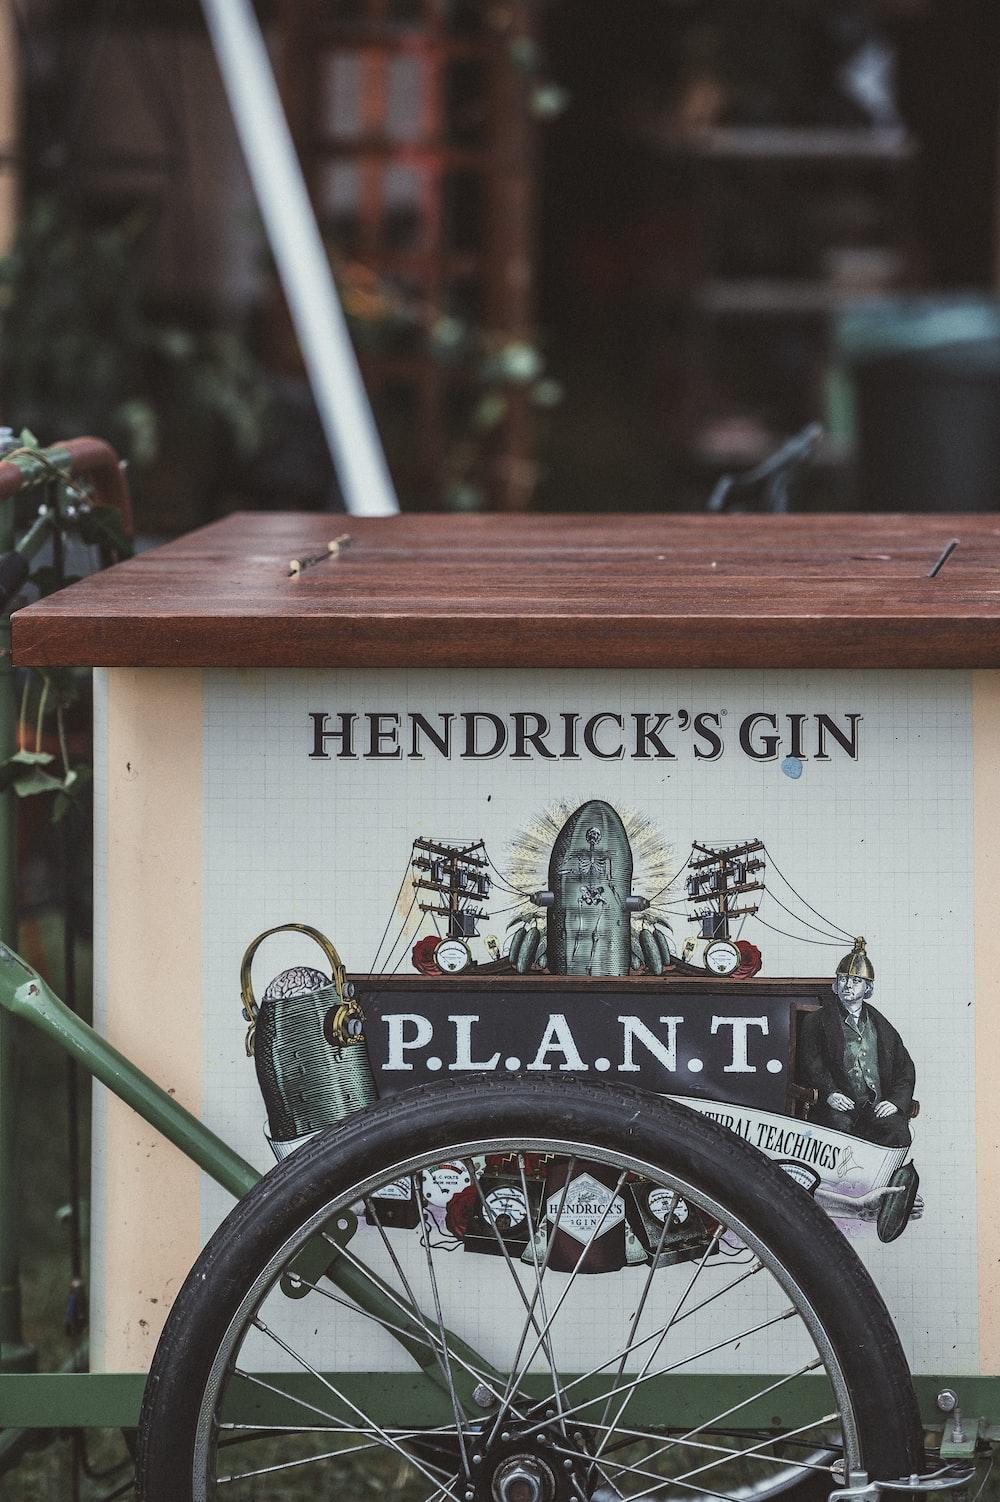 Hendrick's Gin food cart